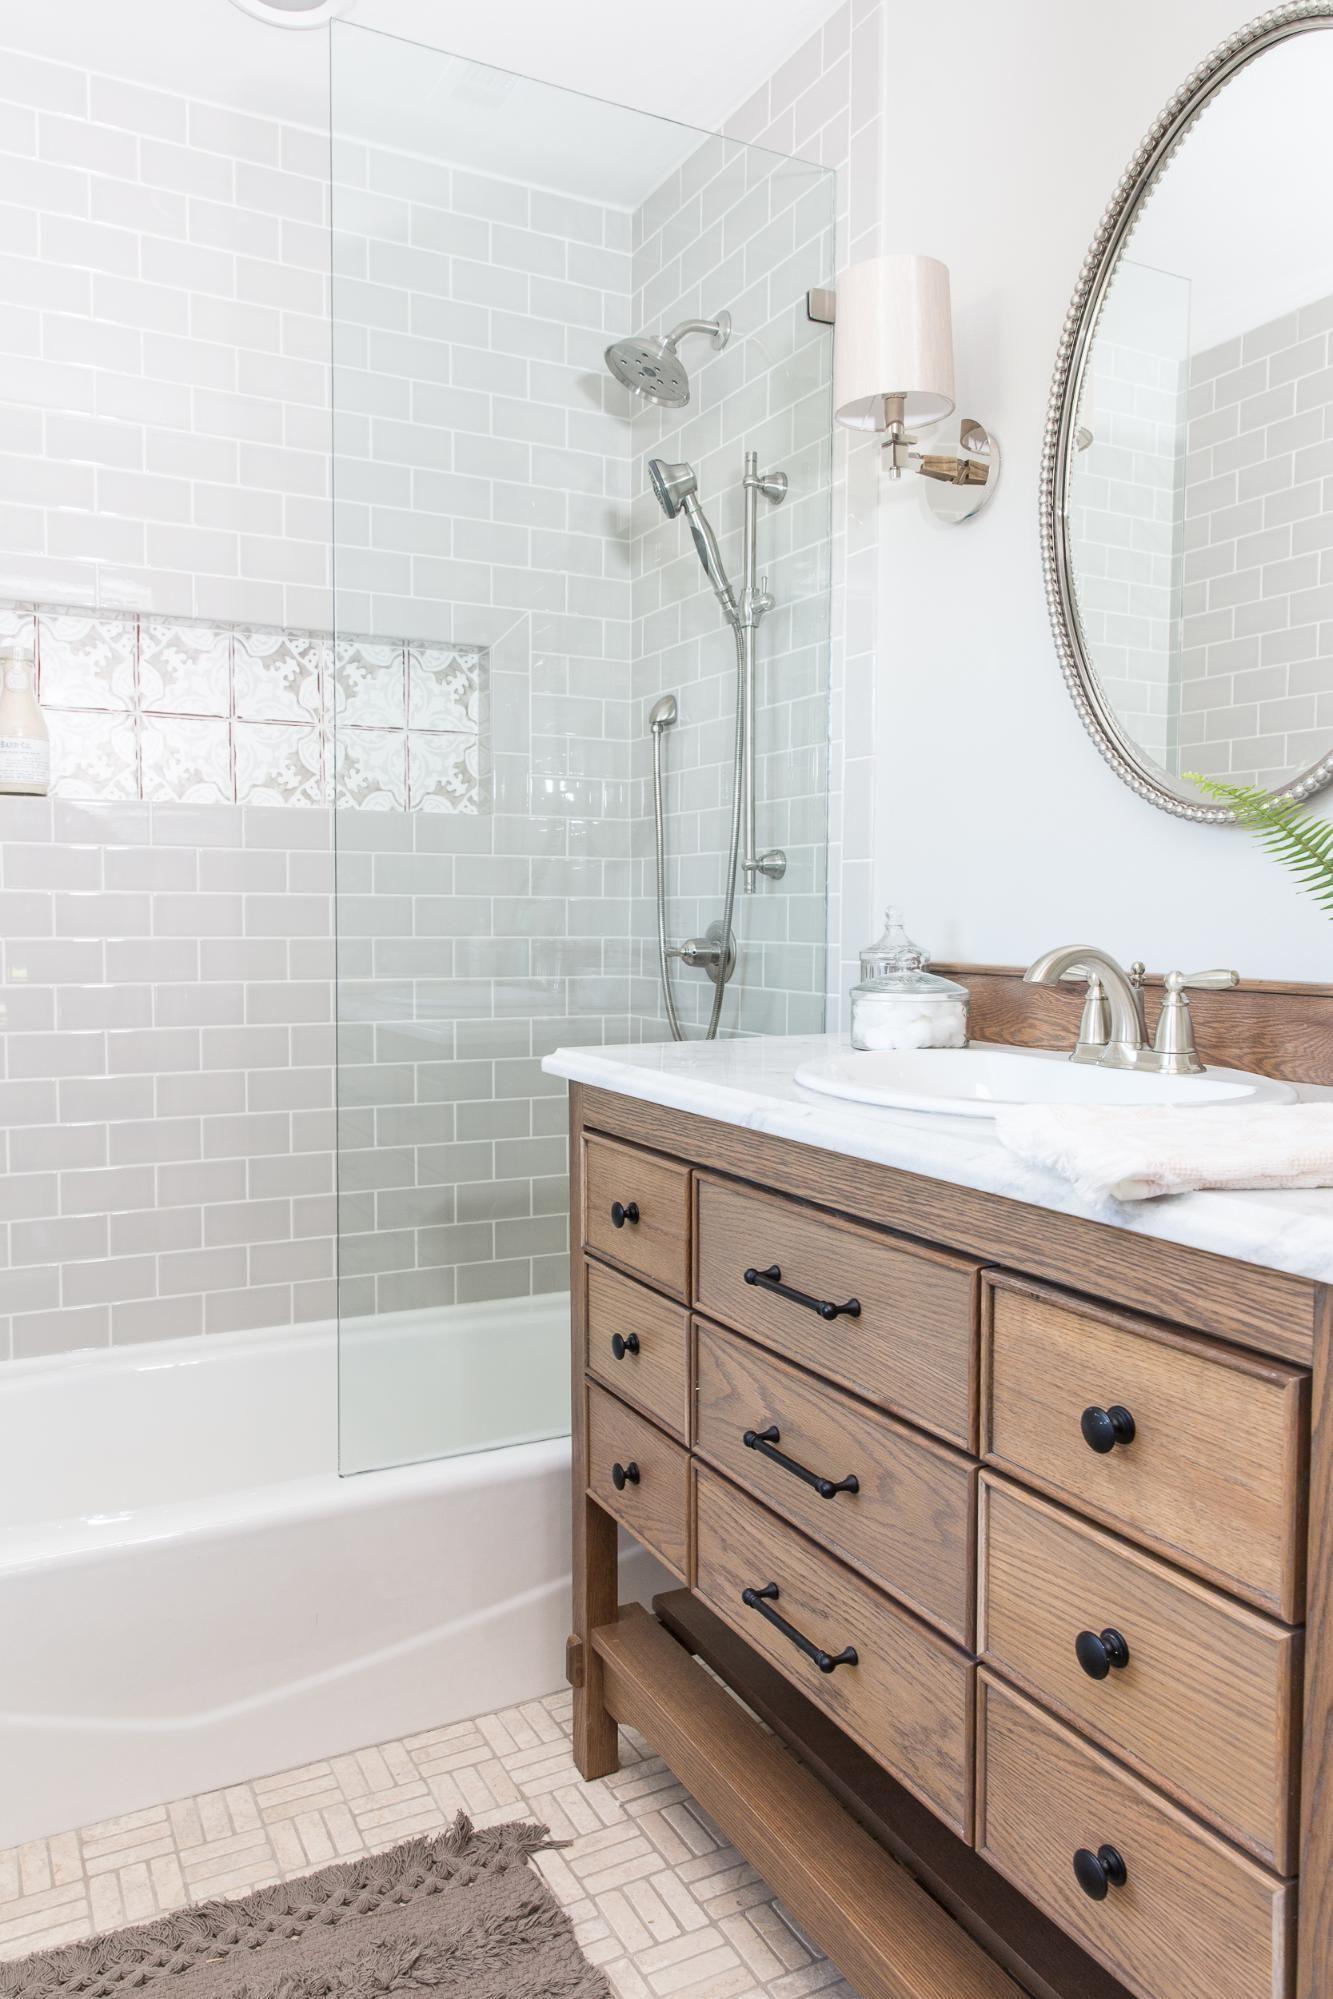 Episode 5 Season 5 Hgtv S Fixer Upper Chip Jo Gaines Bathrooms Remodel Bathroom Interior Bathroom Design